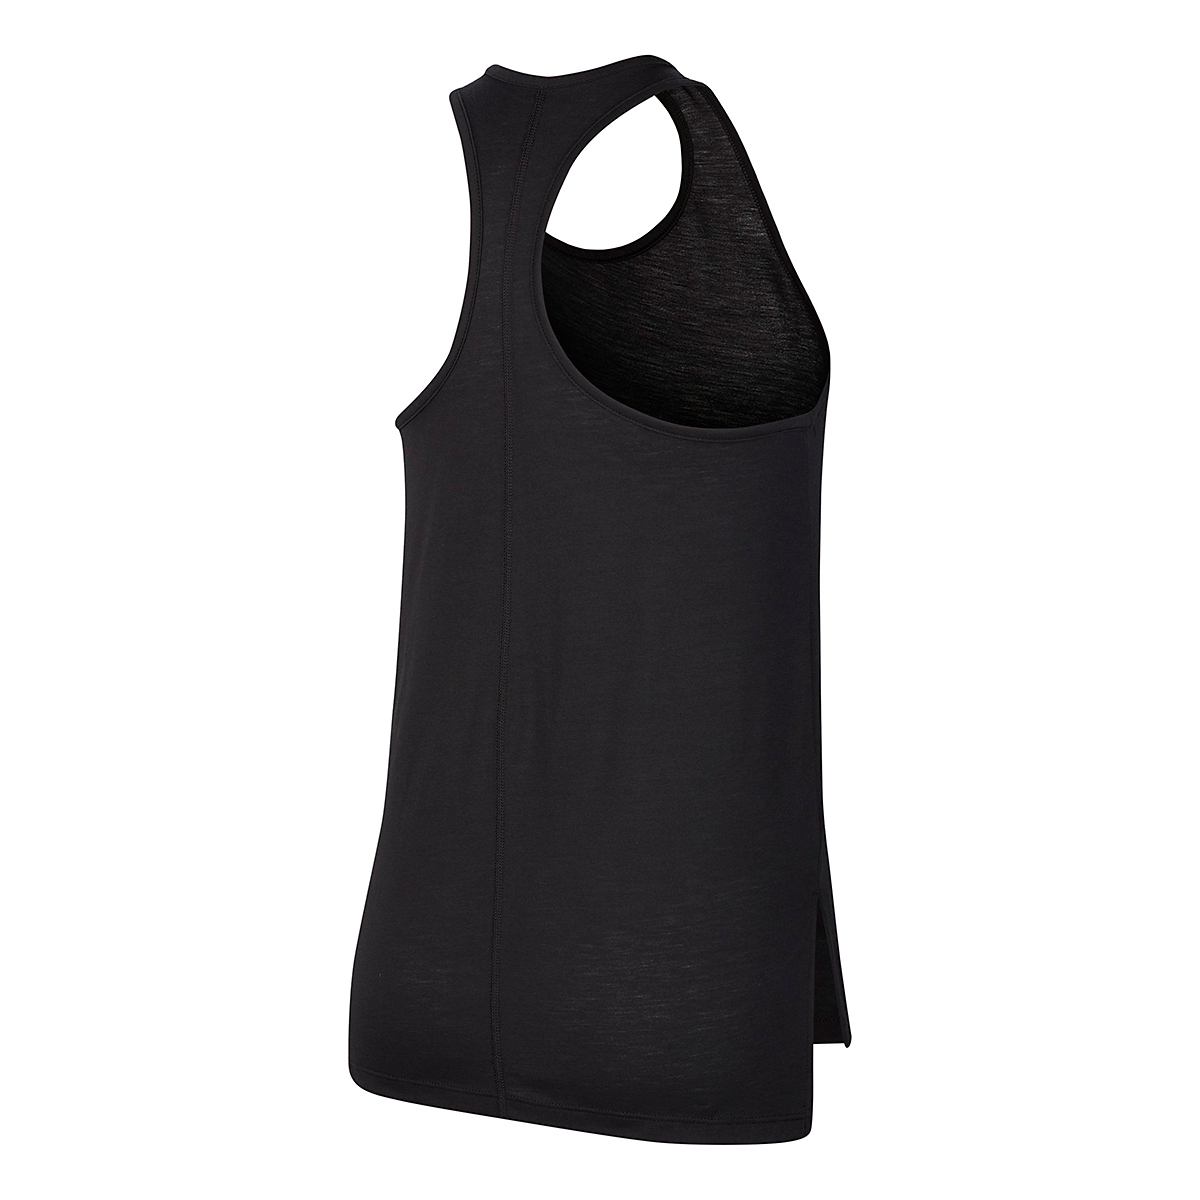 Women's Nike Yoga Layer Tank - Color: Black/Dark Smoke Grey - Size: XS, Black/Dark Smoke Grey, large, image 3